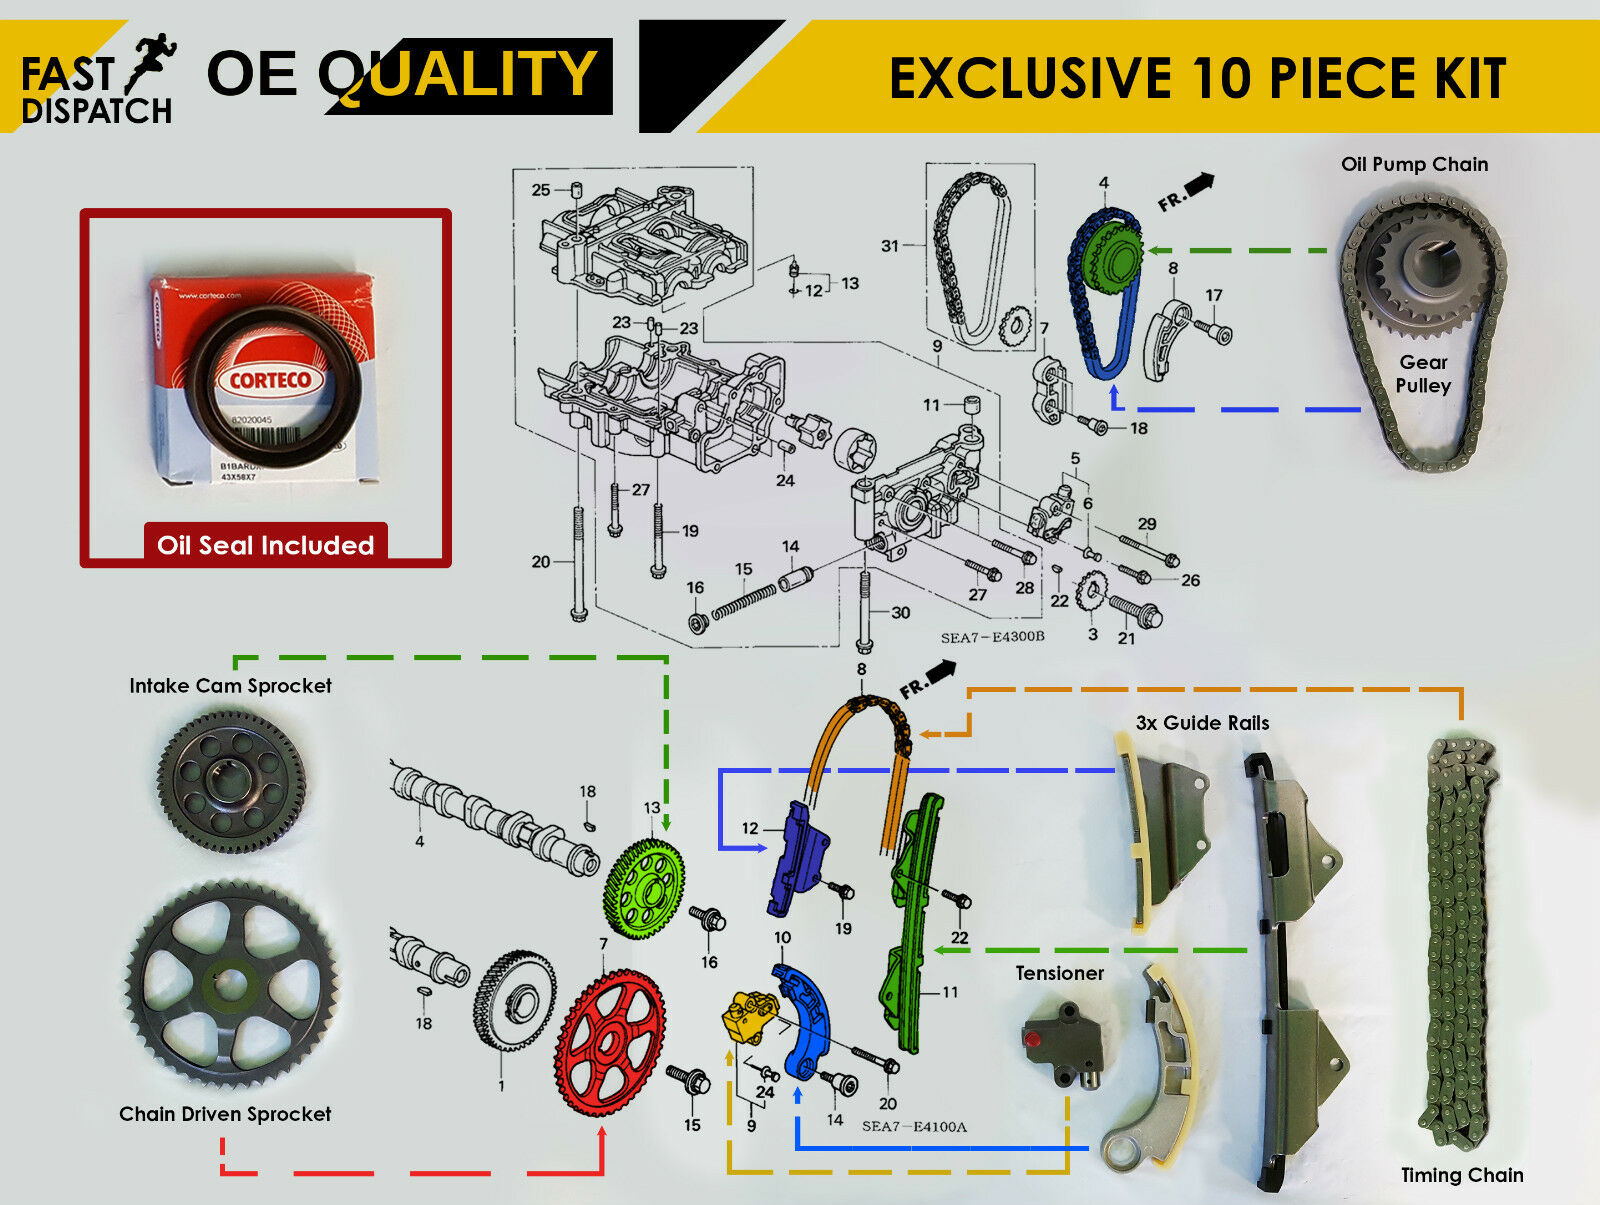 vauxhall corsa timing chain diagram basic wiring for race car honda accord civic crv frv 2 ctdi diesel full kit tensioner